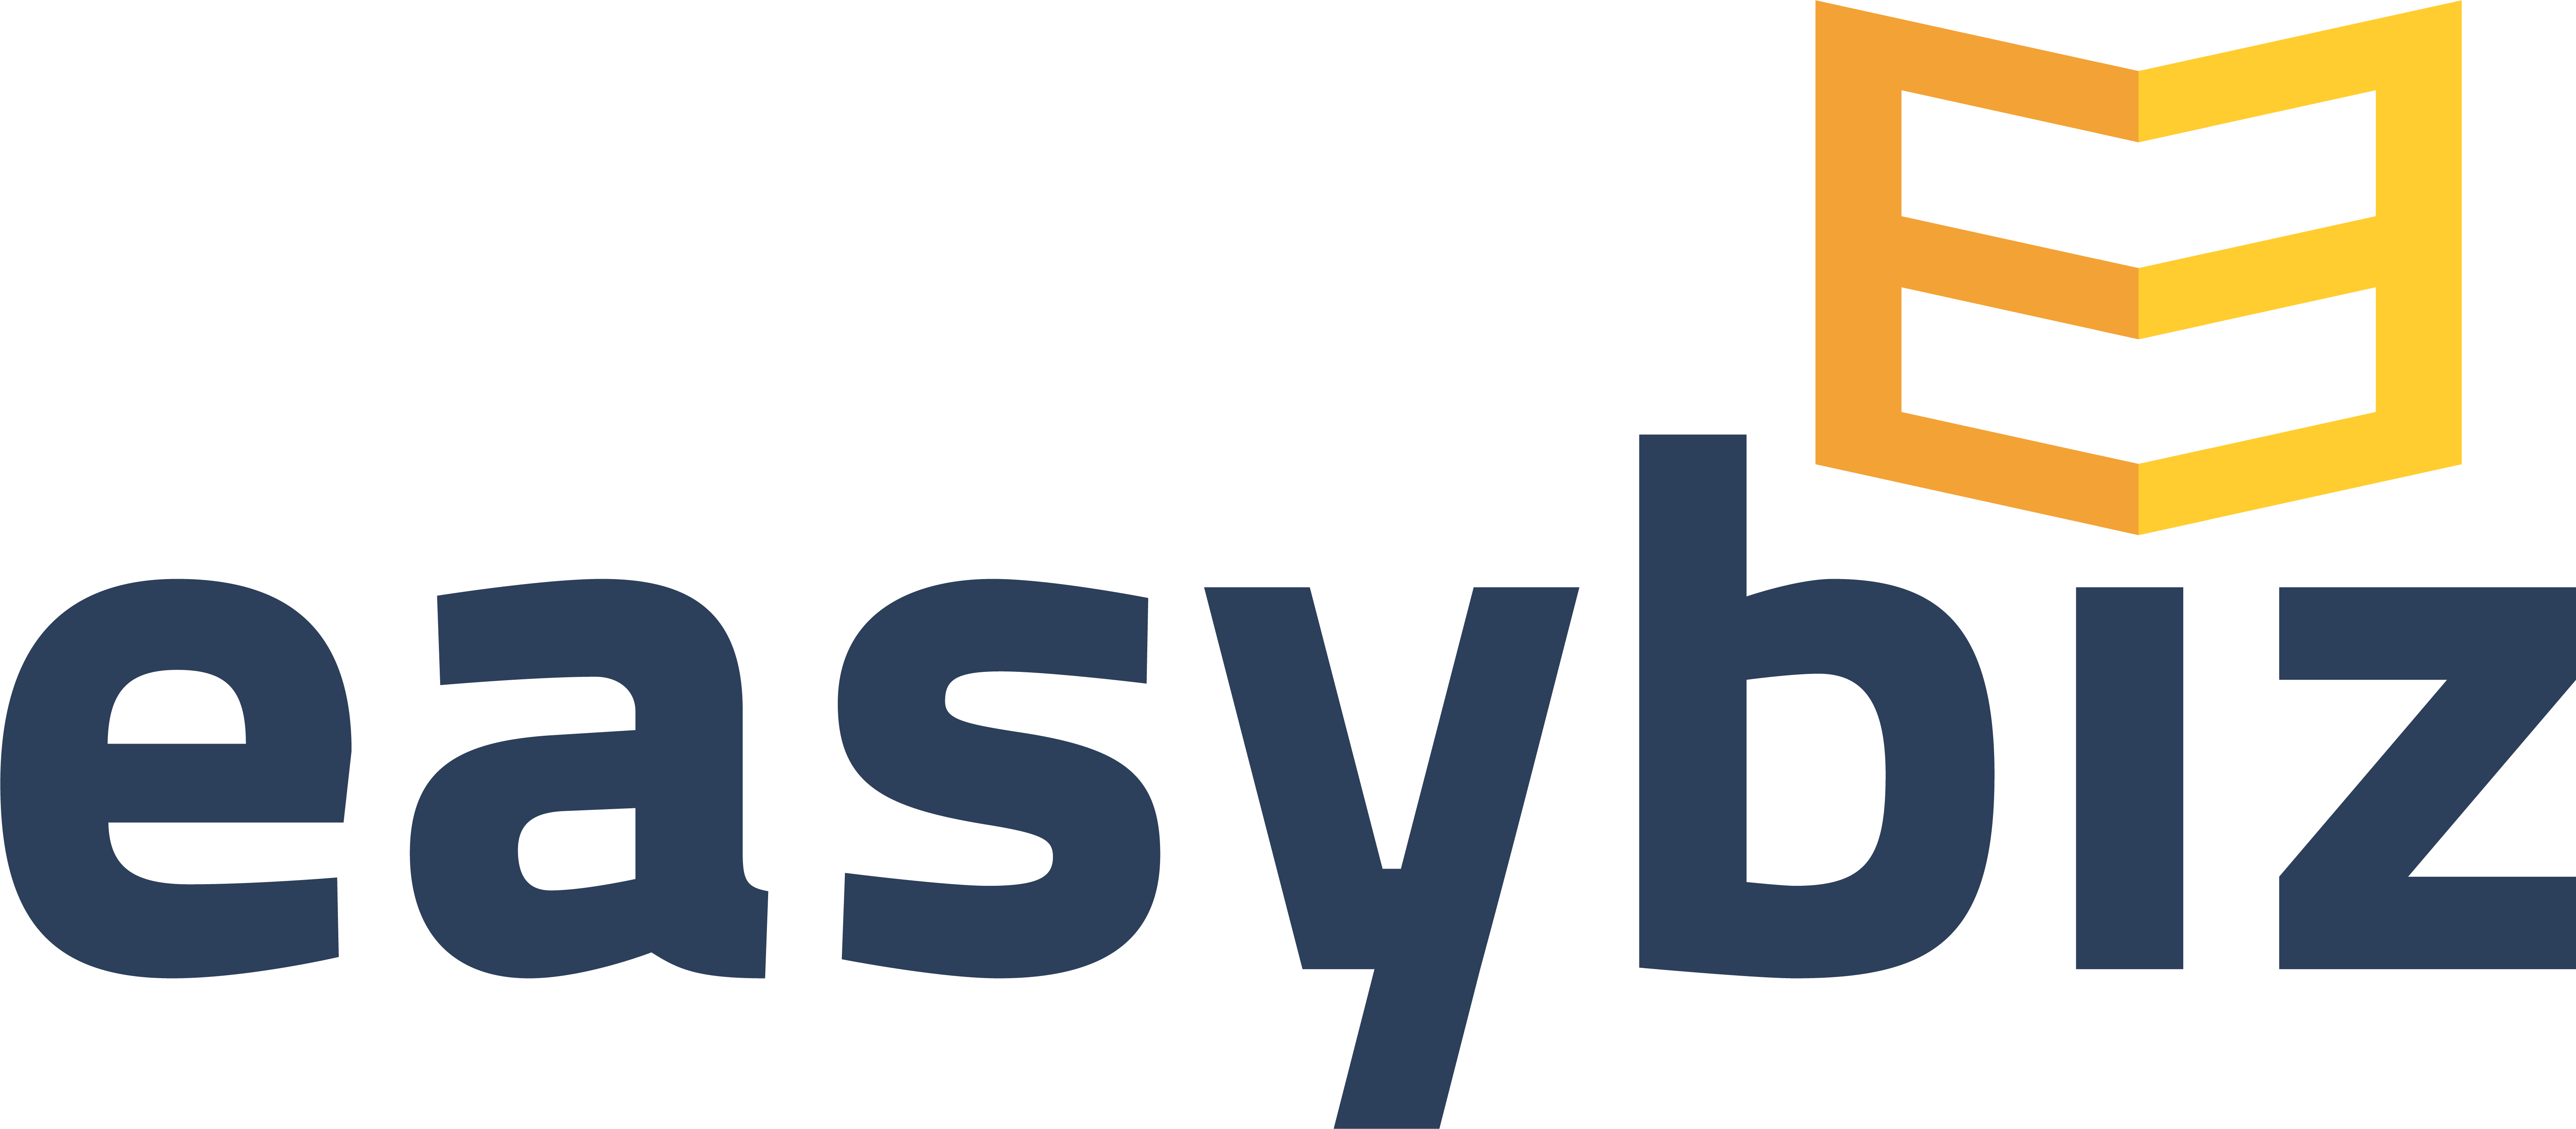 Easybiz - Logo